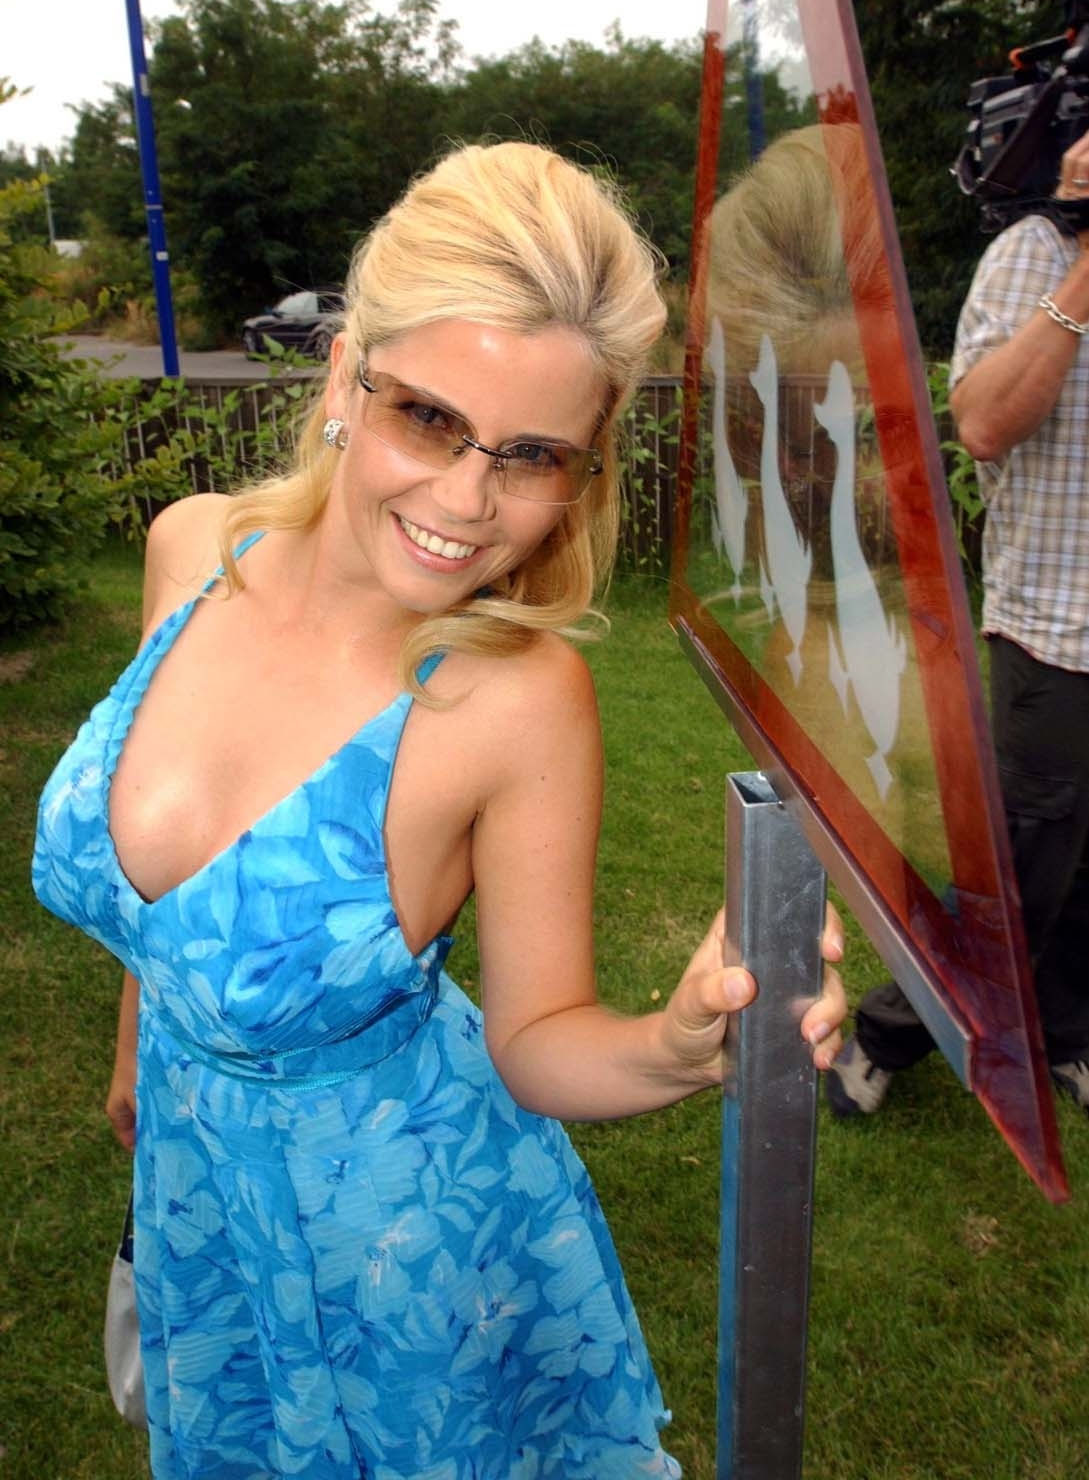 Михаэла Шаффрат (Gina Wild) голая. Фото - 80